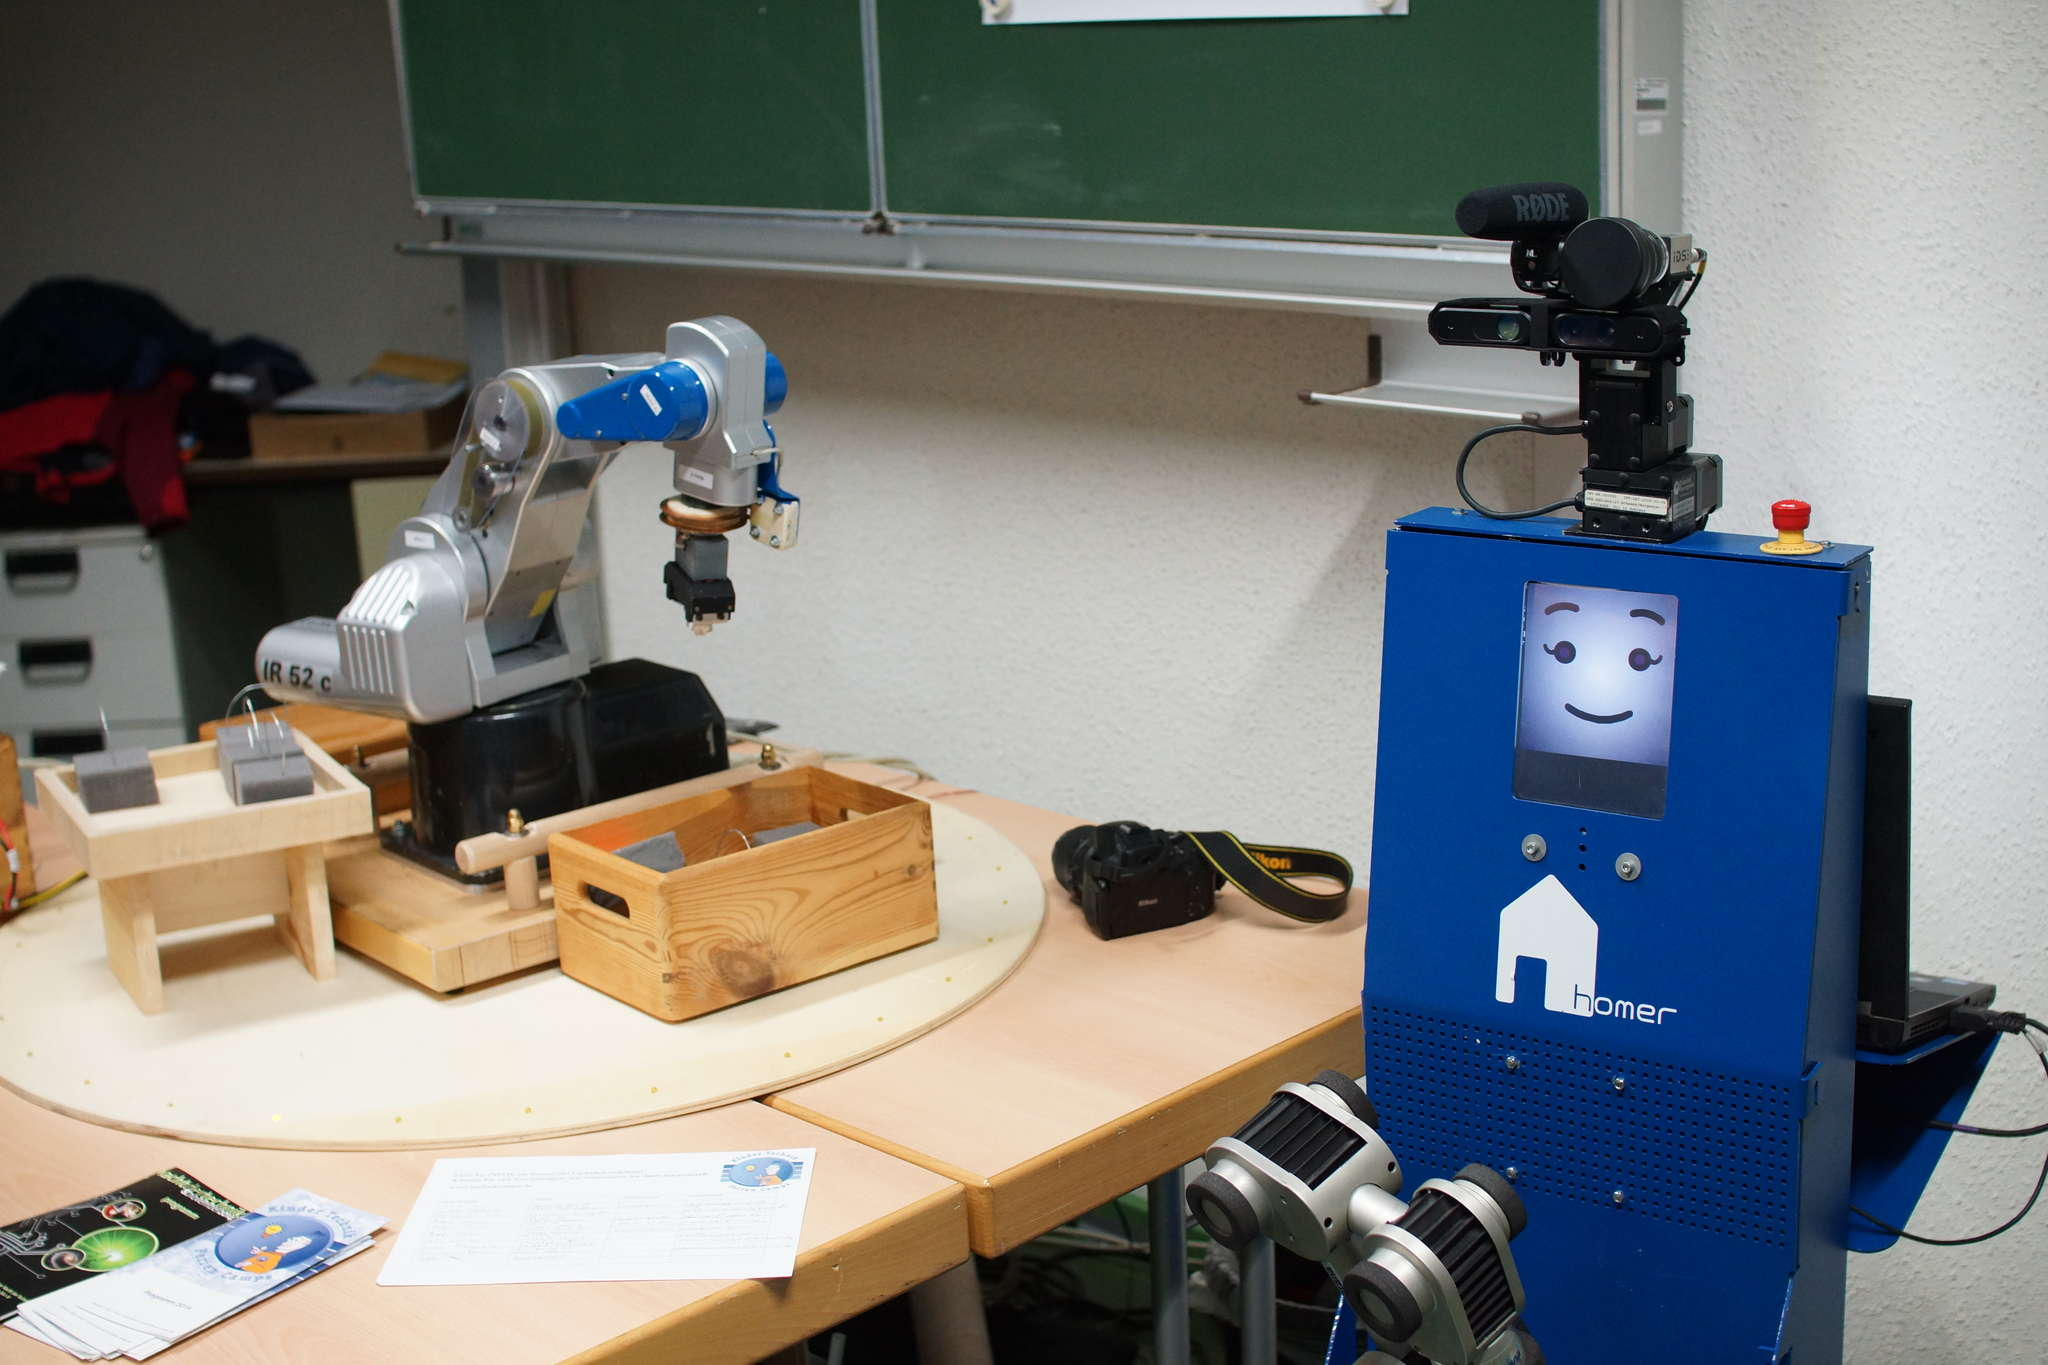 Lisa and the robotic arm